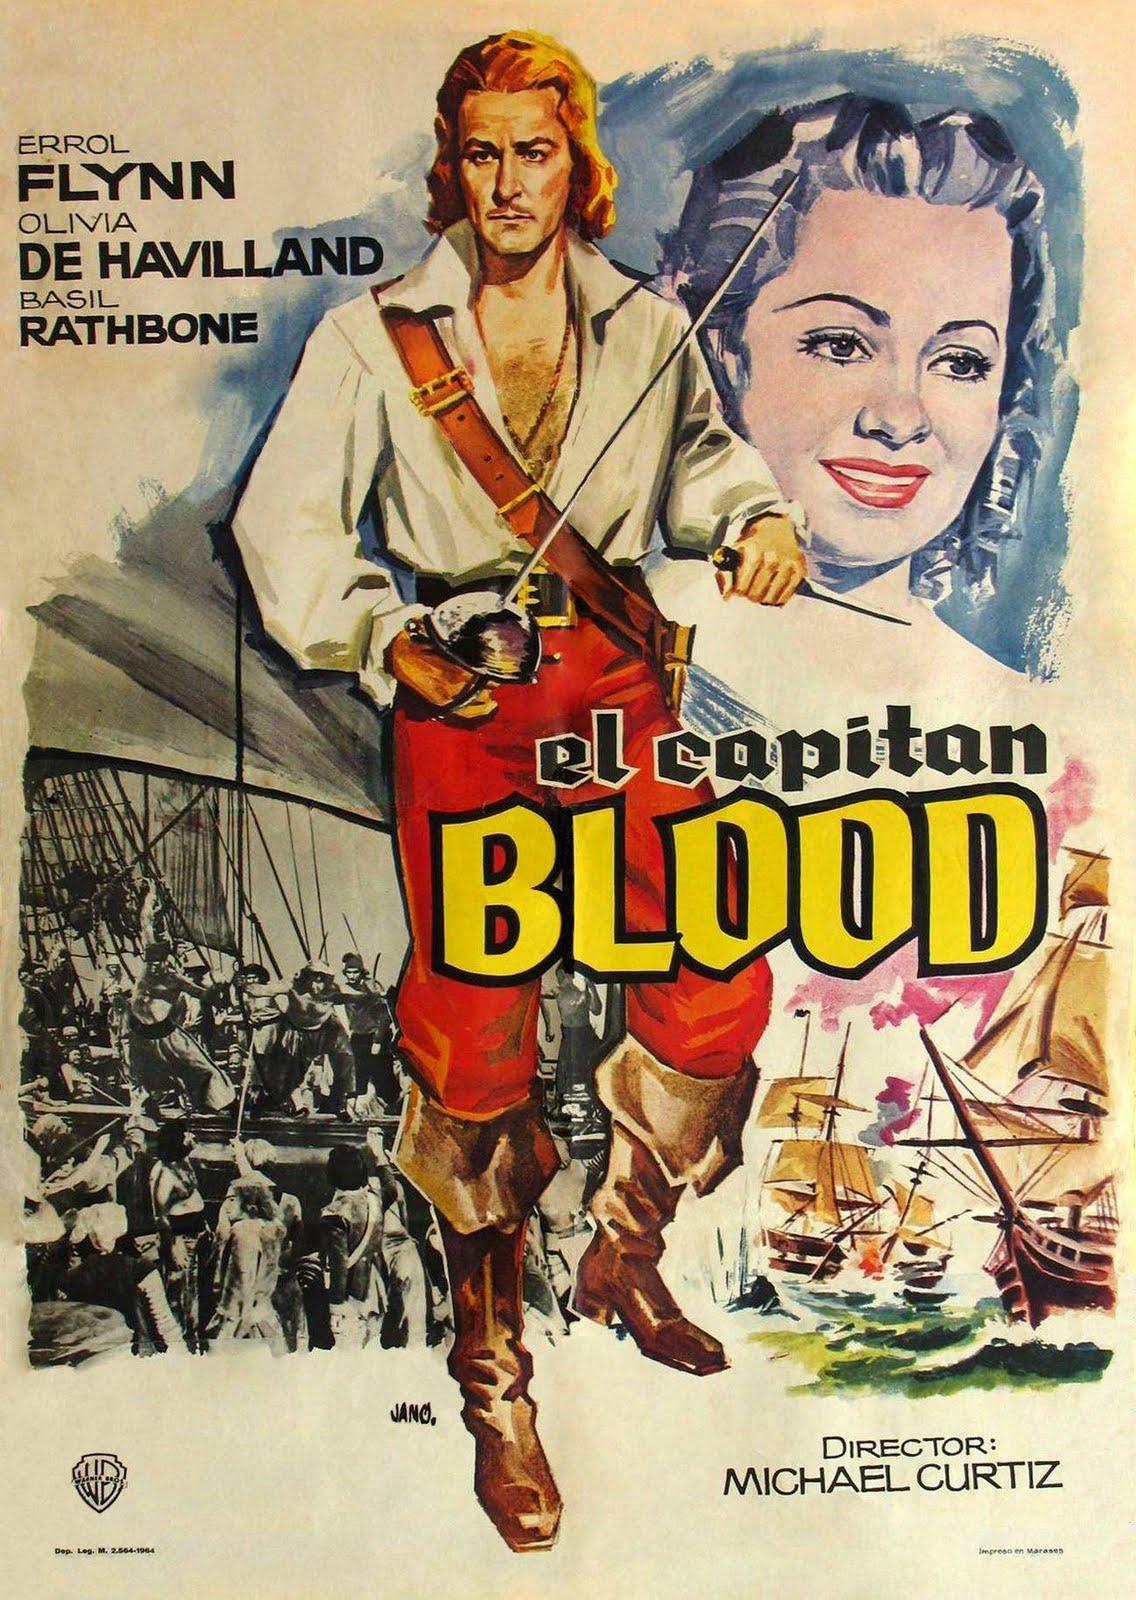 691-1935-elcapitanblood-espanol-0552158002.jpg